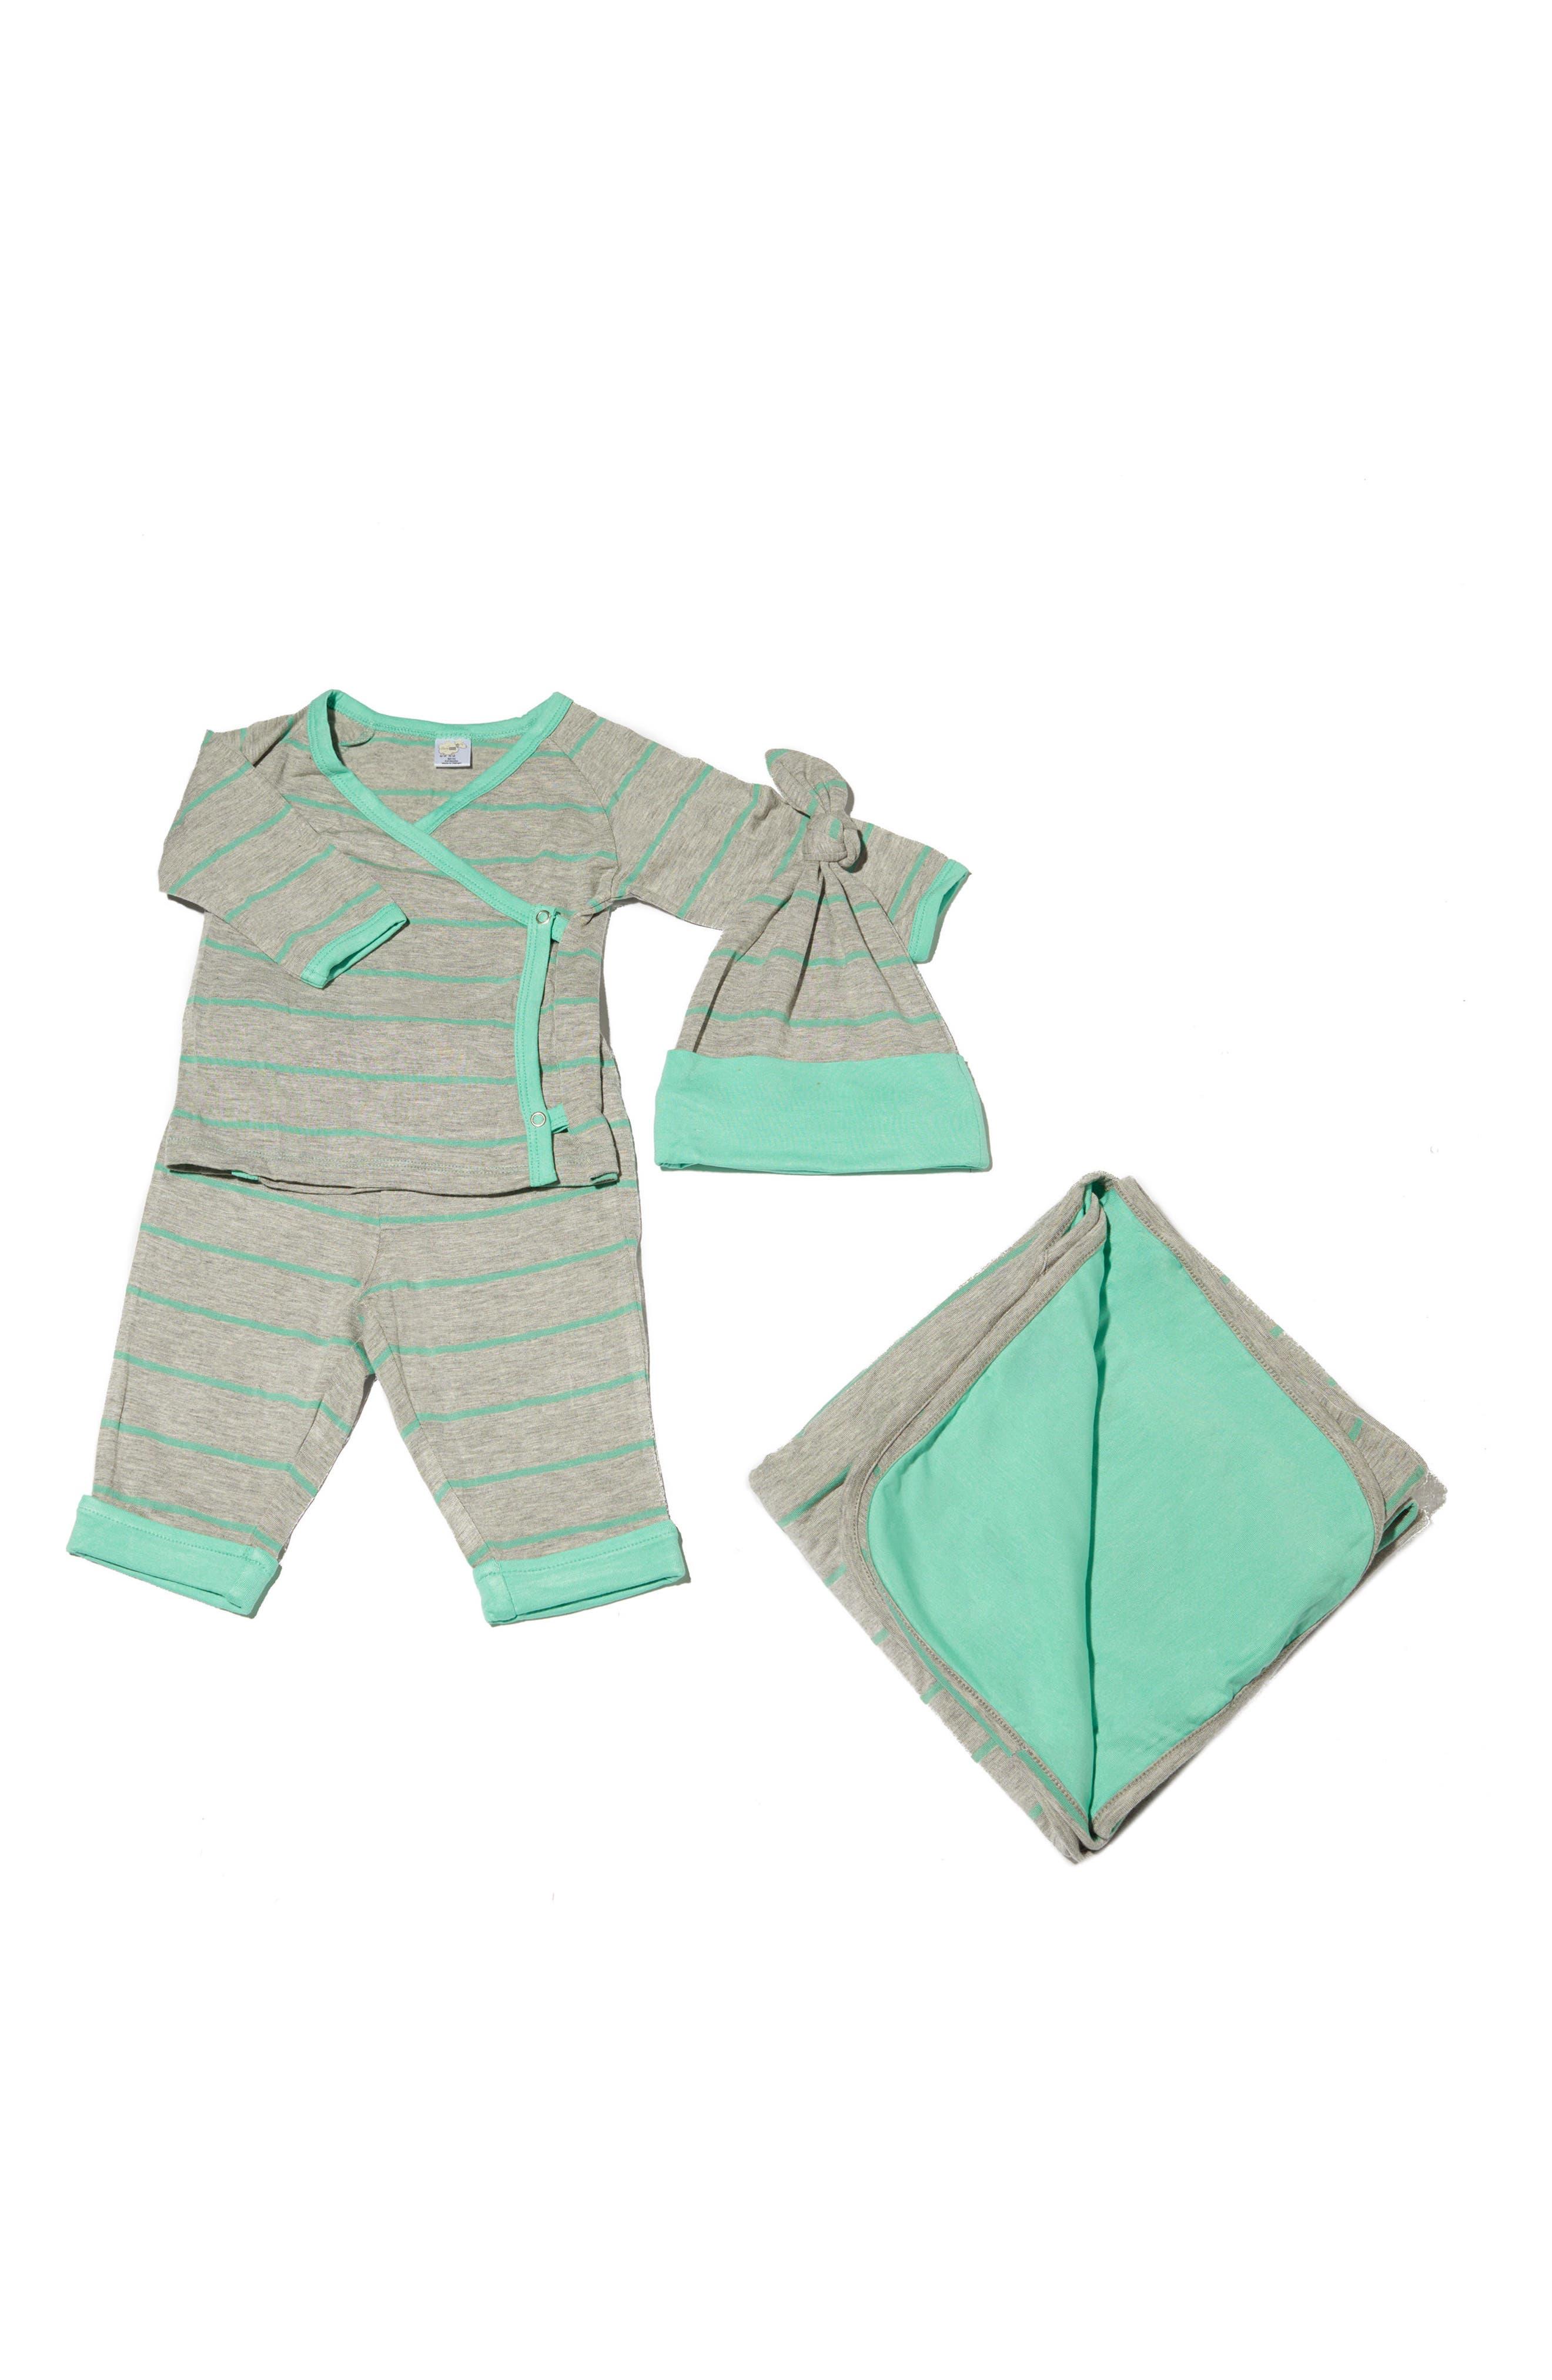 BABY GREY, T-Shirt, Pants, Hat & Blanket Set, Main thumbnail 1, color, SEAFOAM